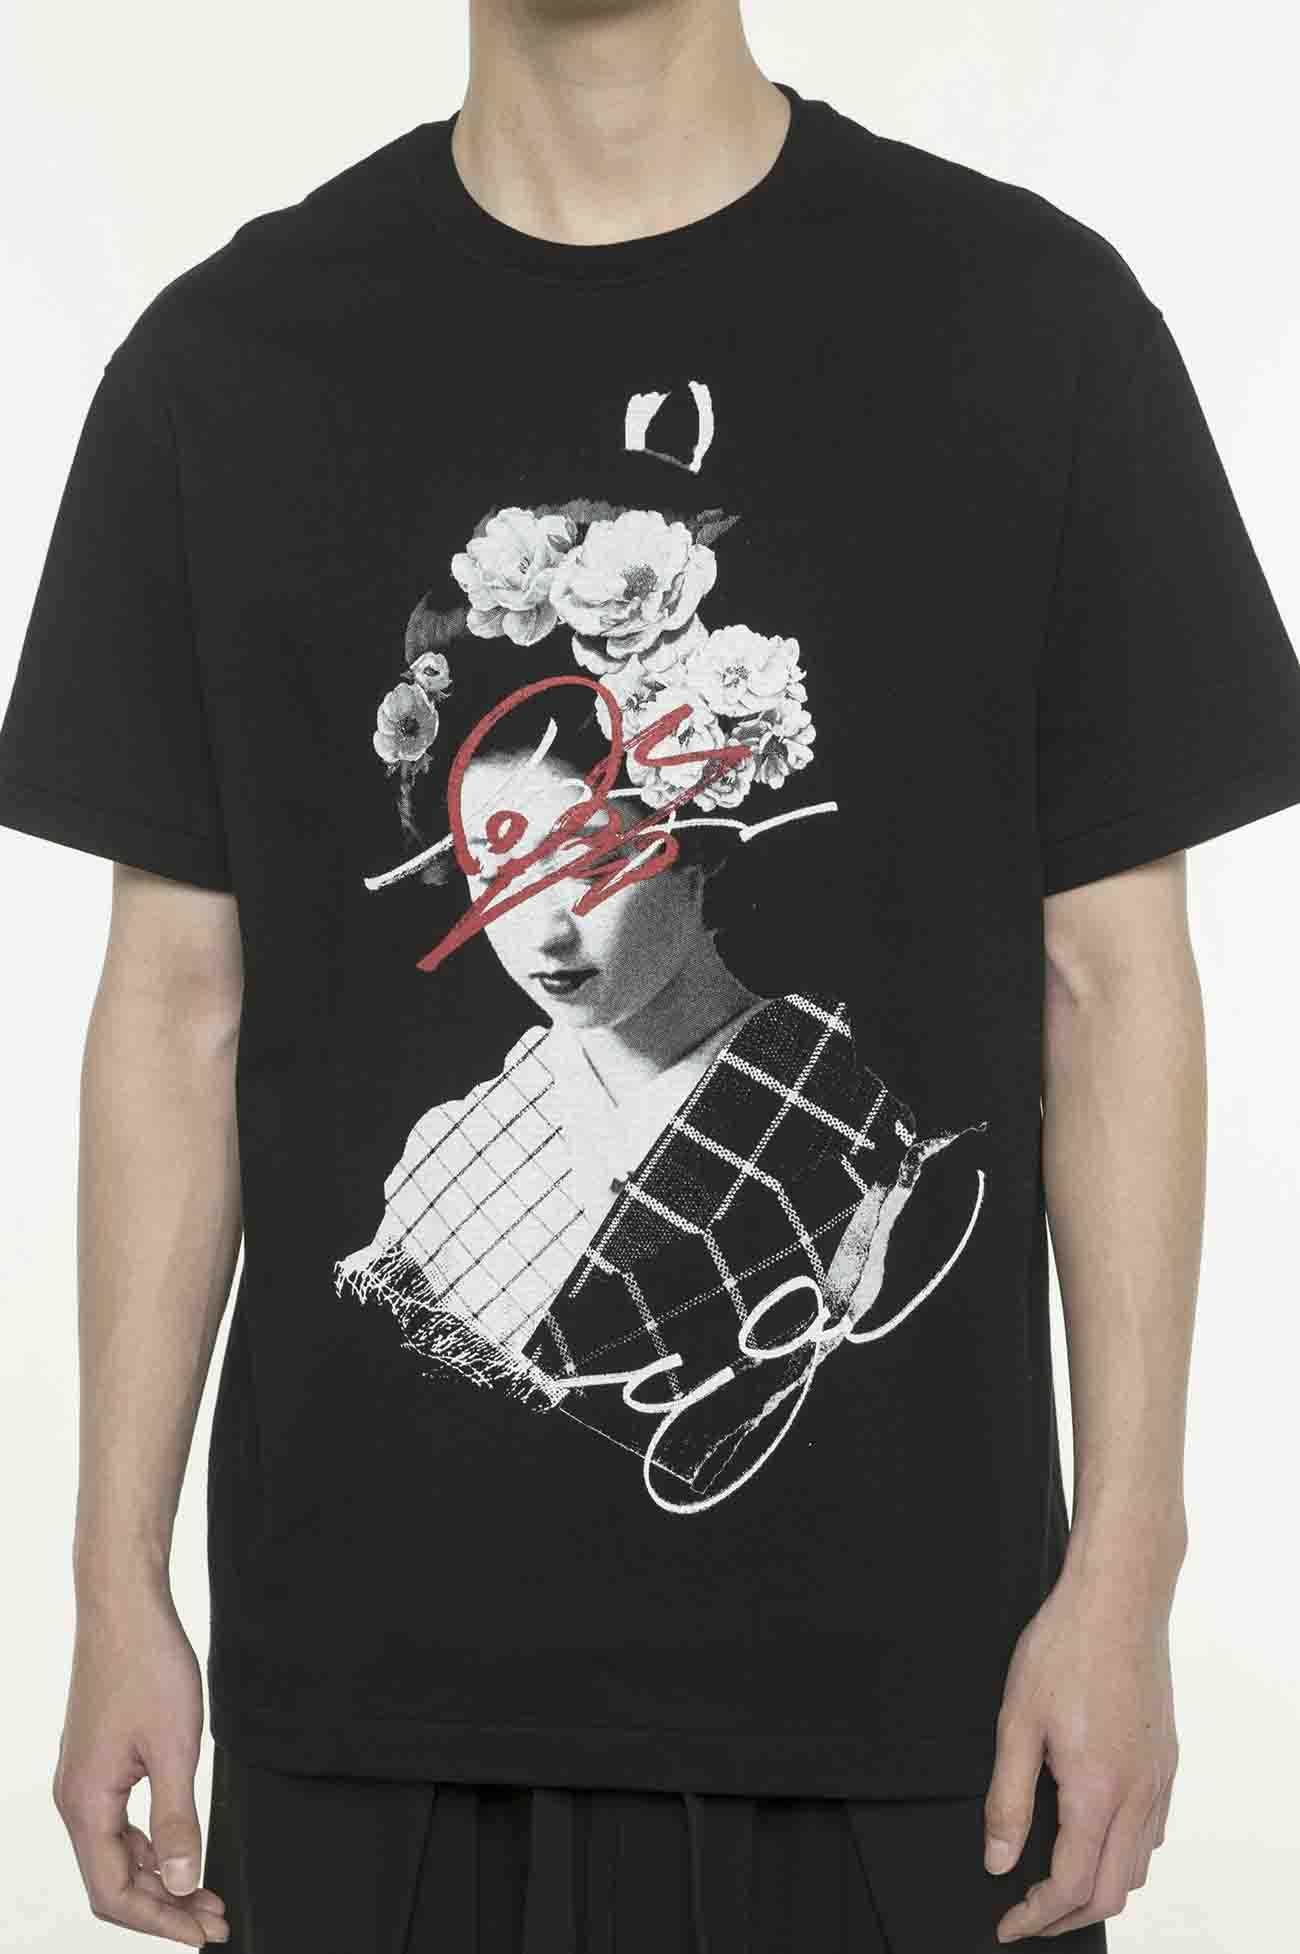 20/CottonJersey Maiko T-shirt